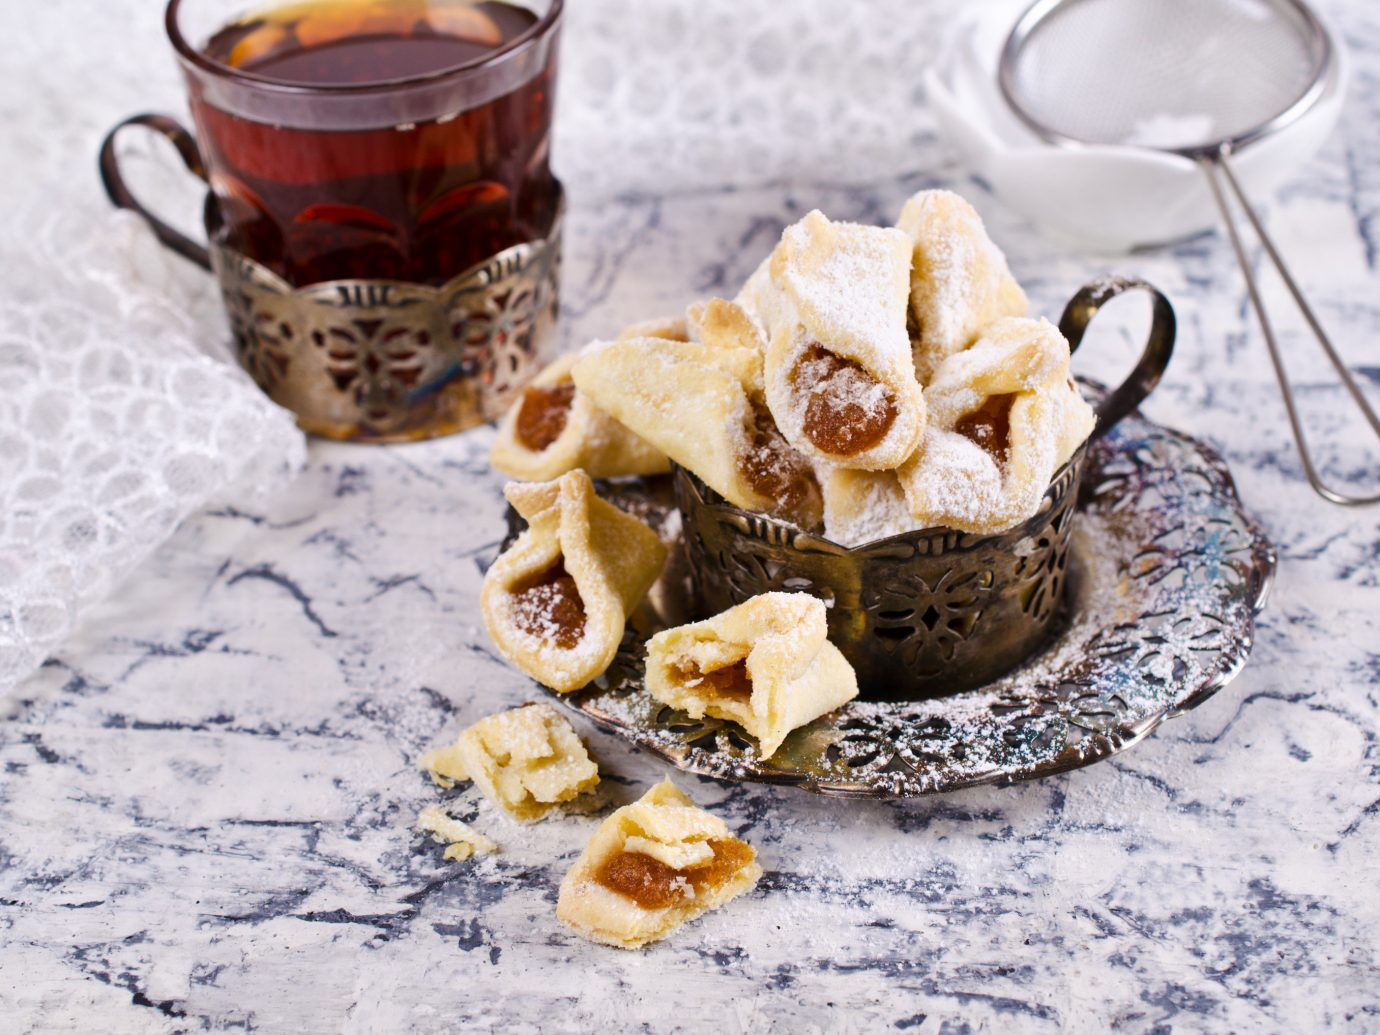 Trip Ideas cup food coffee plate dish meal breakfast dessert piece produce ice slice pastry fruit chocolate ice cream flavor coconut